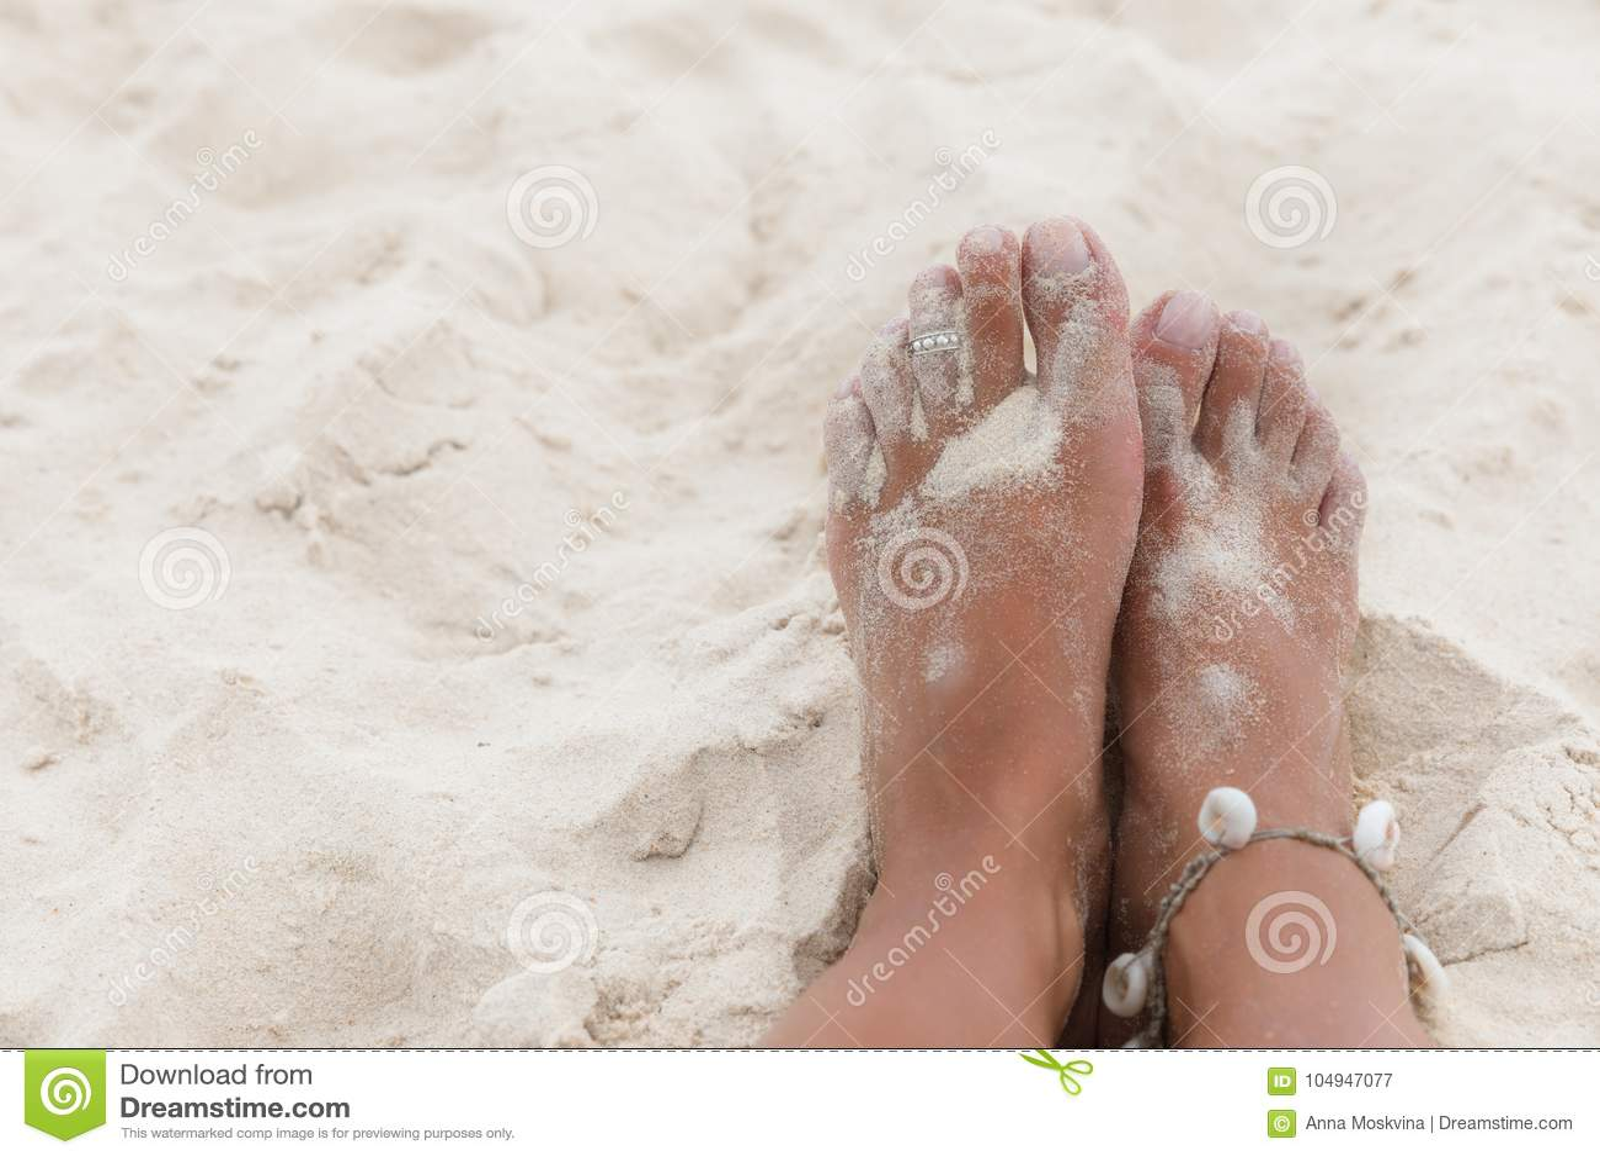 ae7672f233 Πόδια γυναικών στην άμμο της παραλίας θάλασσας Στοκ Εικόνα - εικόνα ...